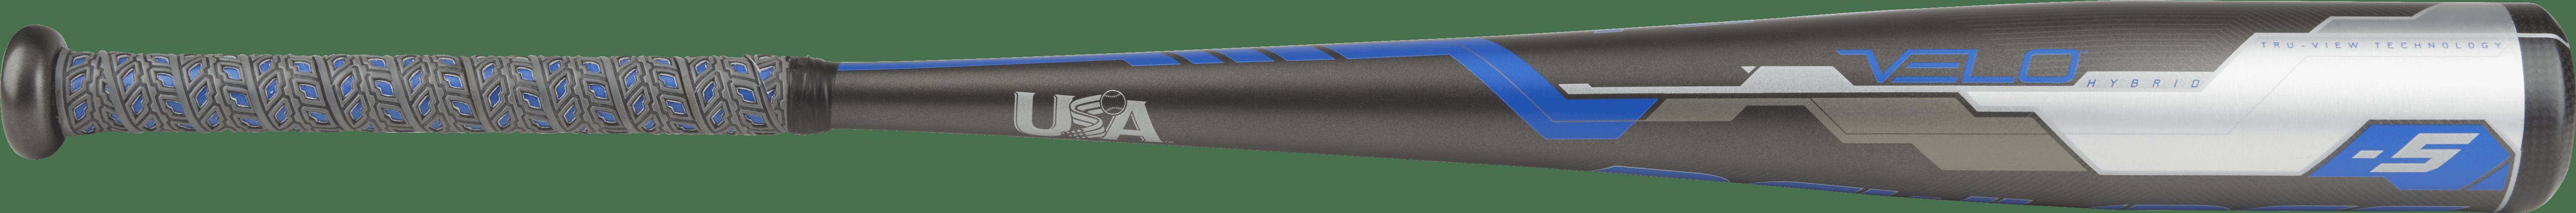 Rawlings Velo Hybrid USA Baseball Bat, 2-5 8-Inch Big Barrel, 31-Inch Length, -5 Drop Weight, 26 Ounces by Rawlings